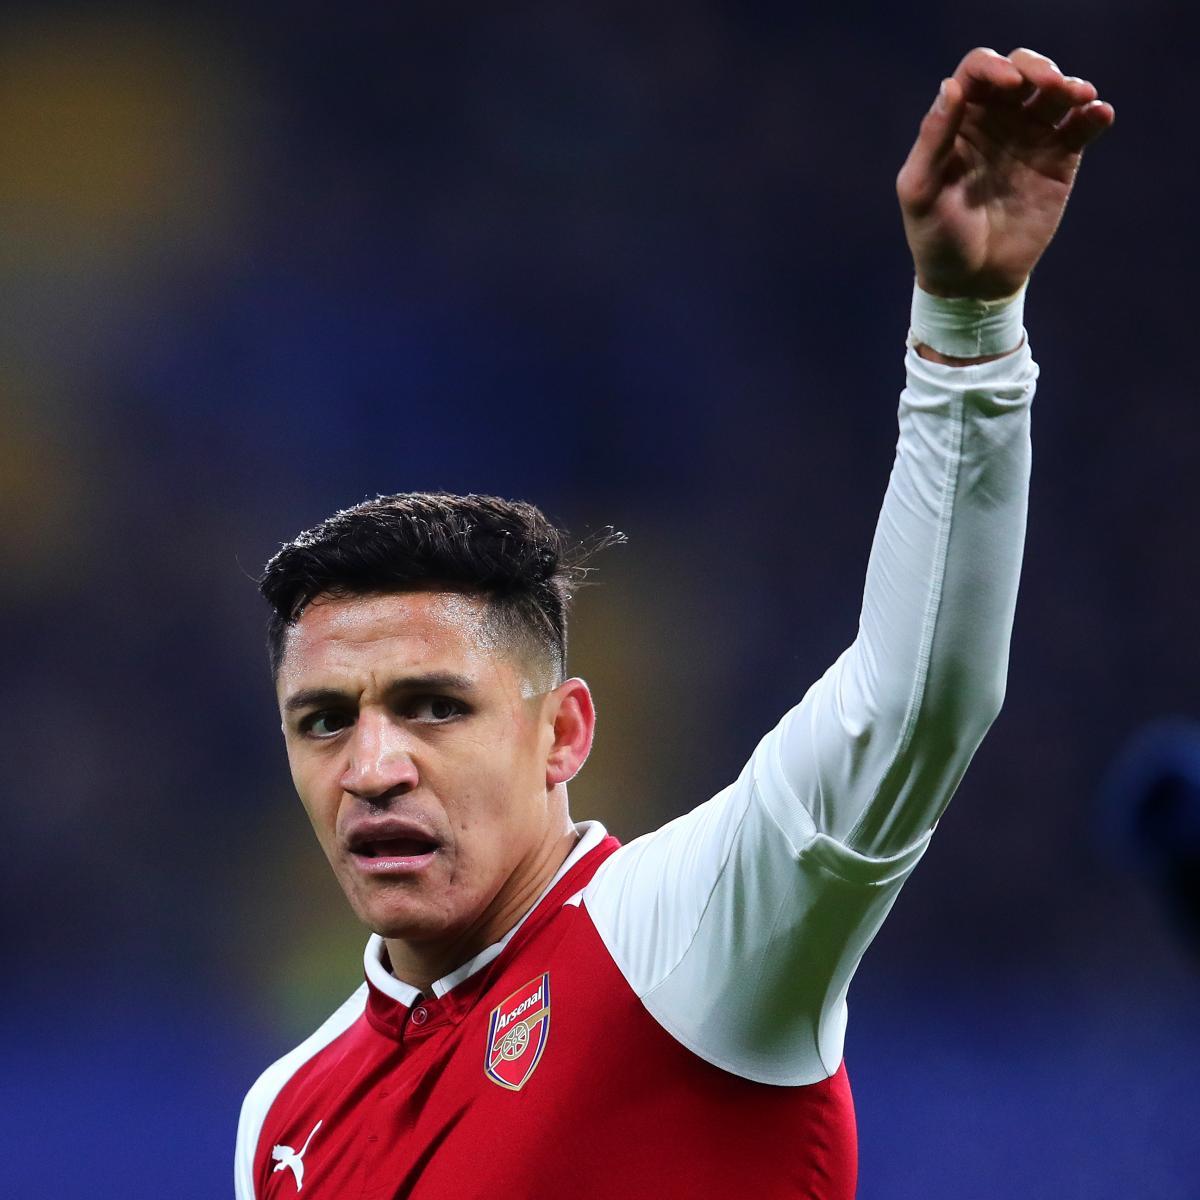 Manchester United Transfer News Alexis Sanchez Rumours: Manchester United Transfer News: Alexis Sanchez Deal